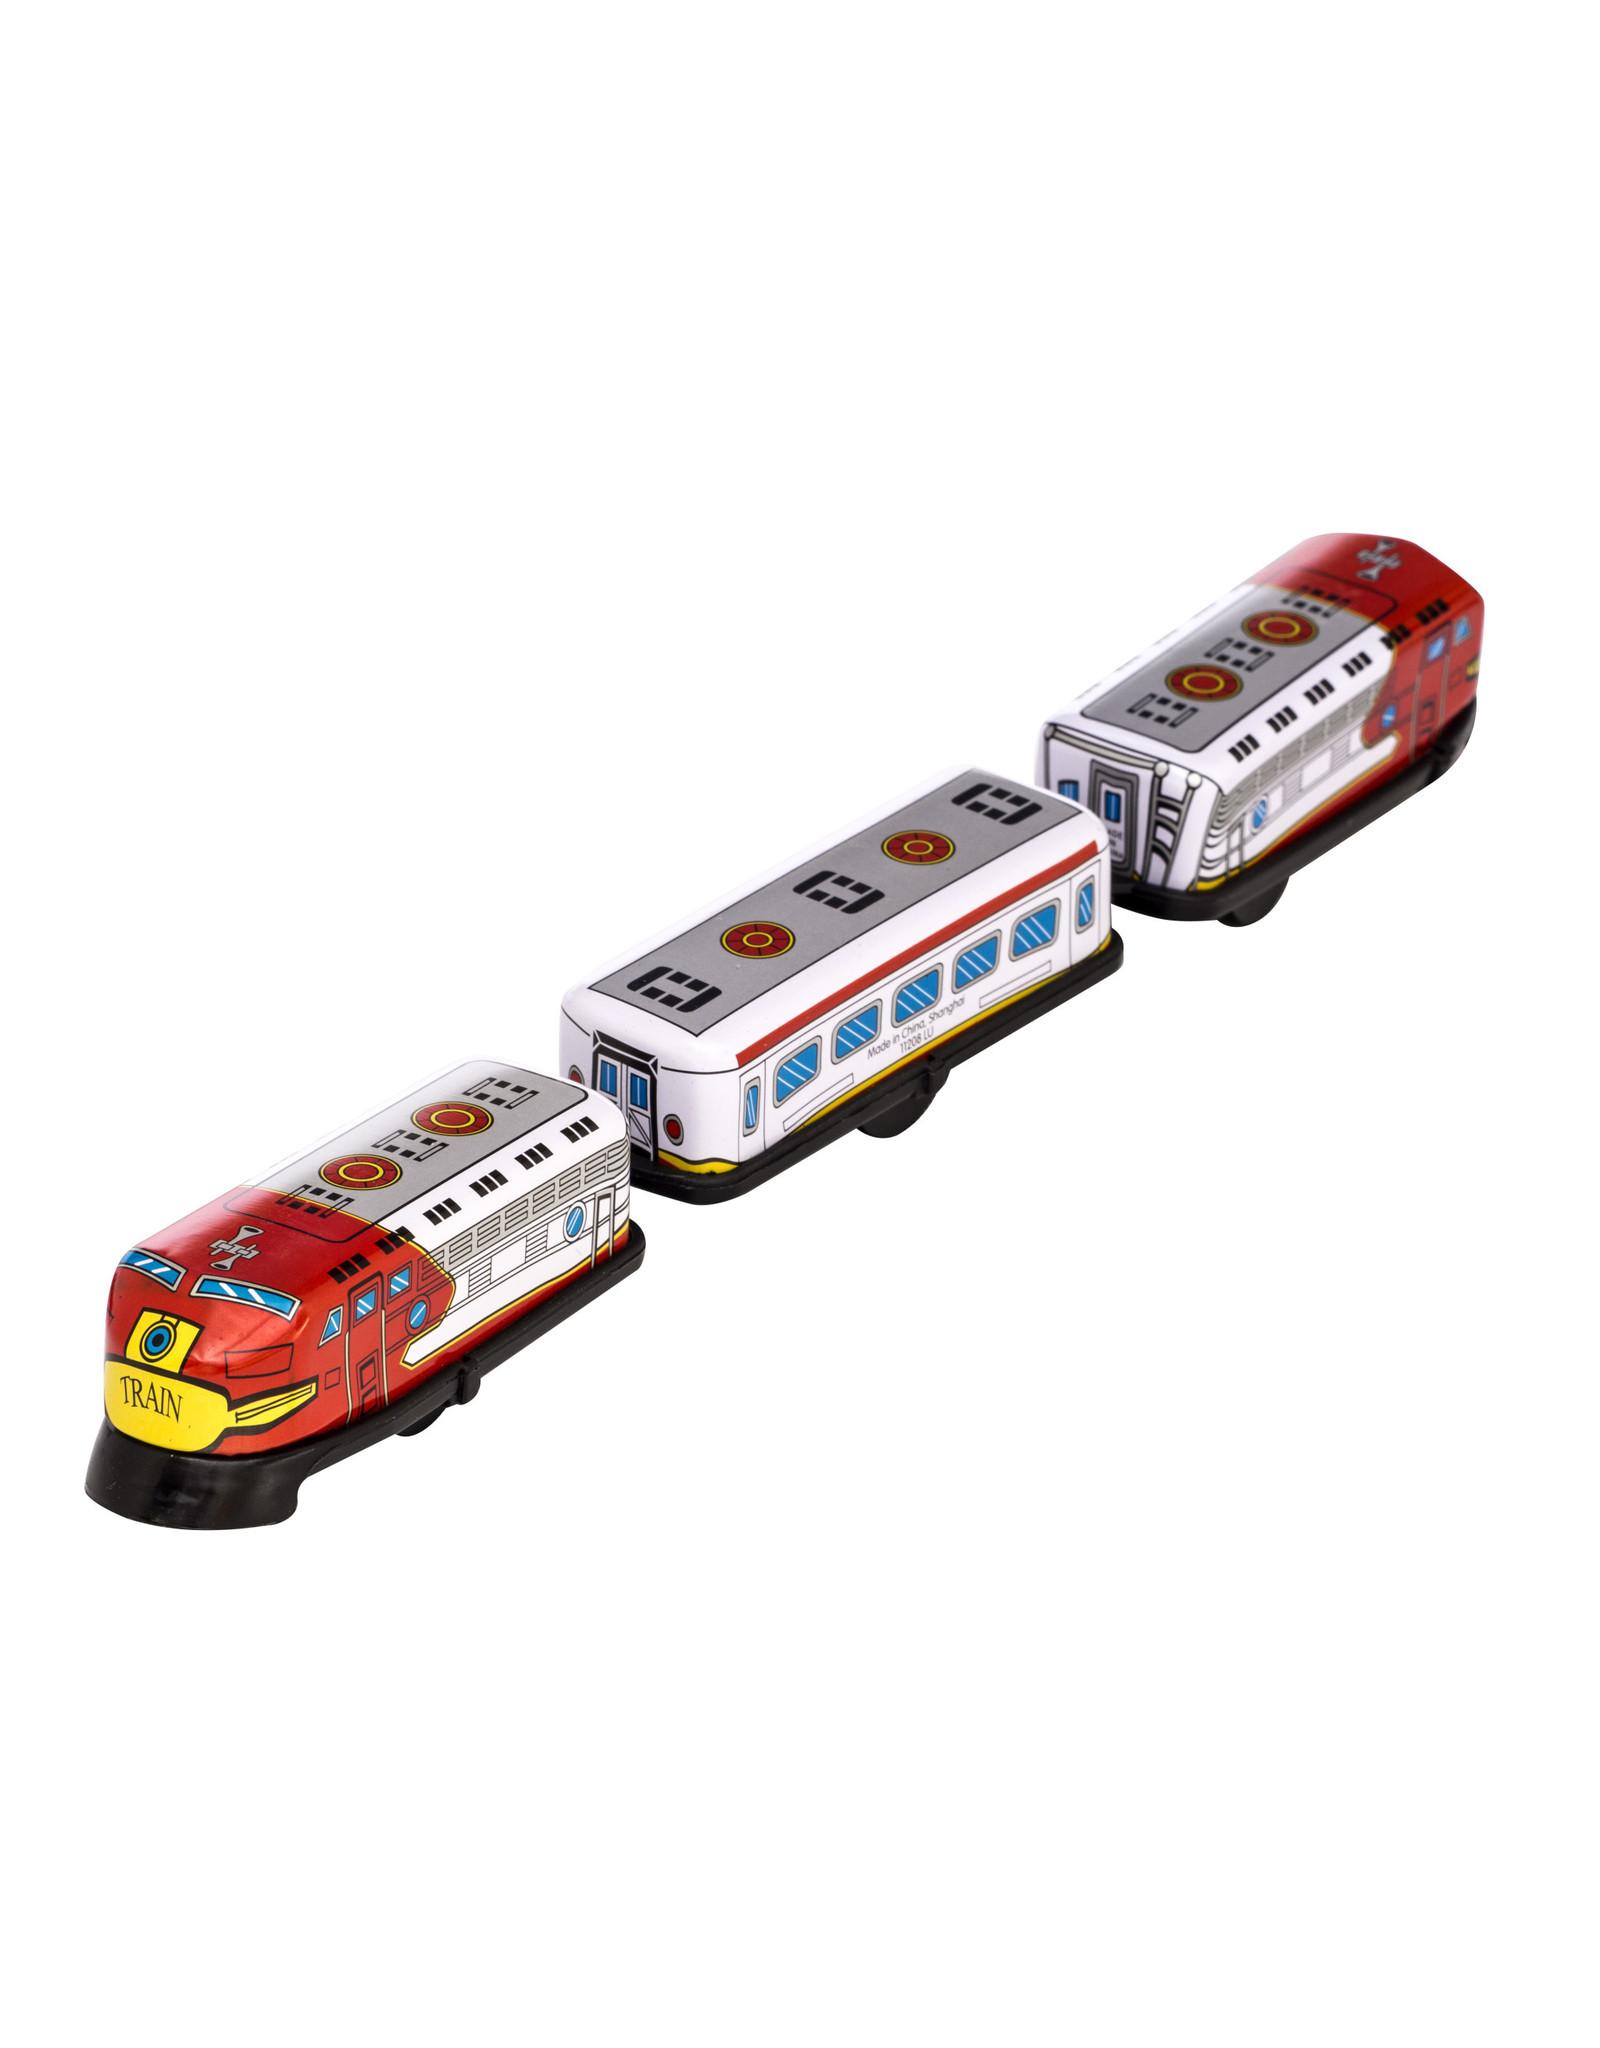 SCHYLLING 3 CAR TRAIN; TIN WIND-UP